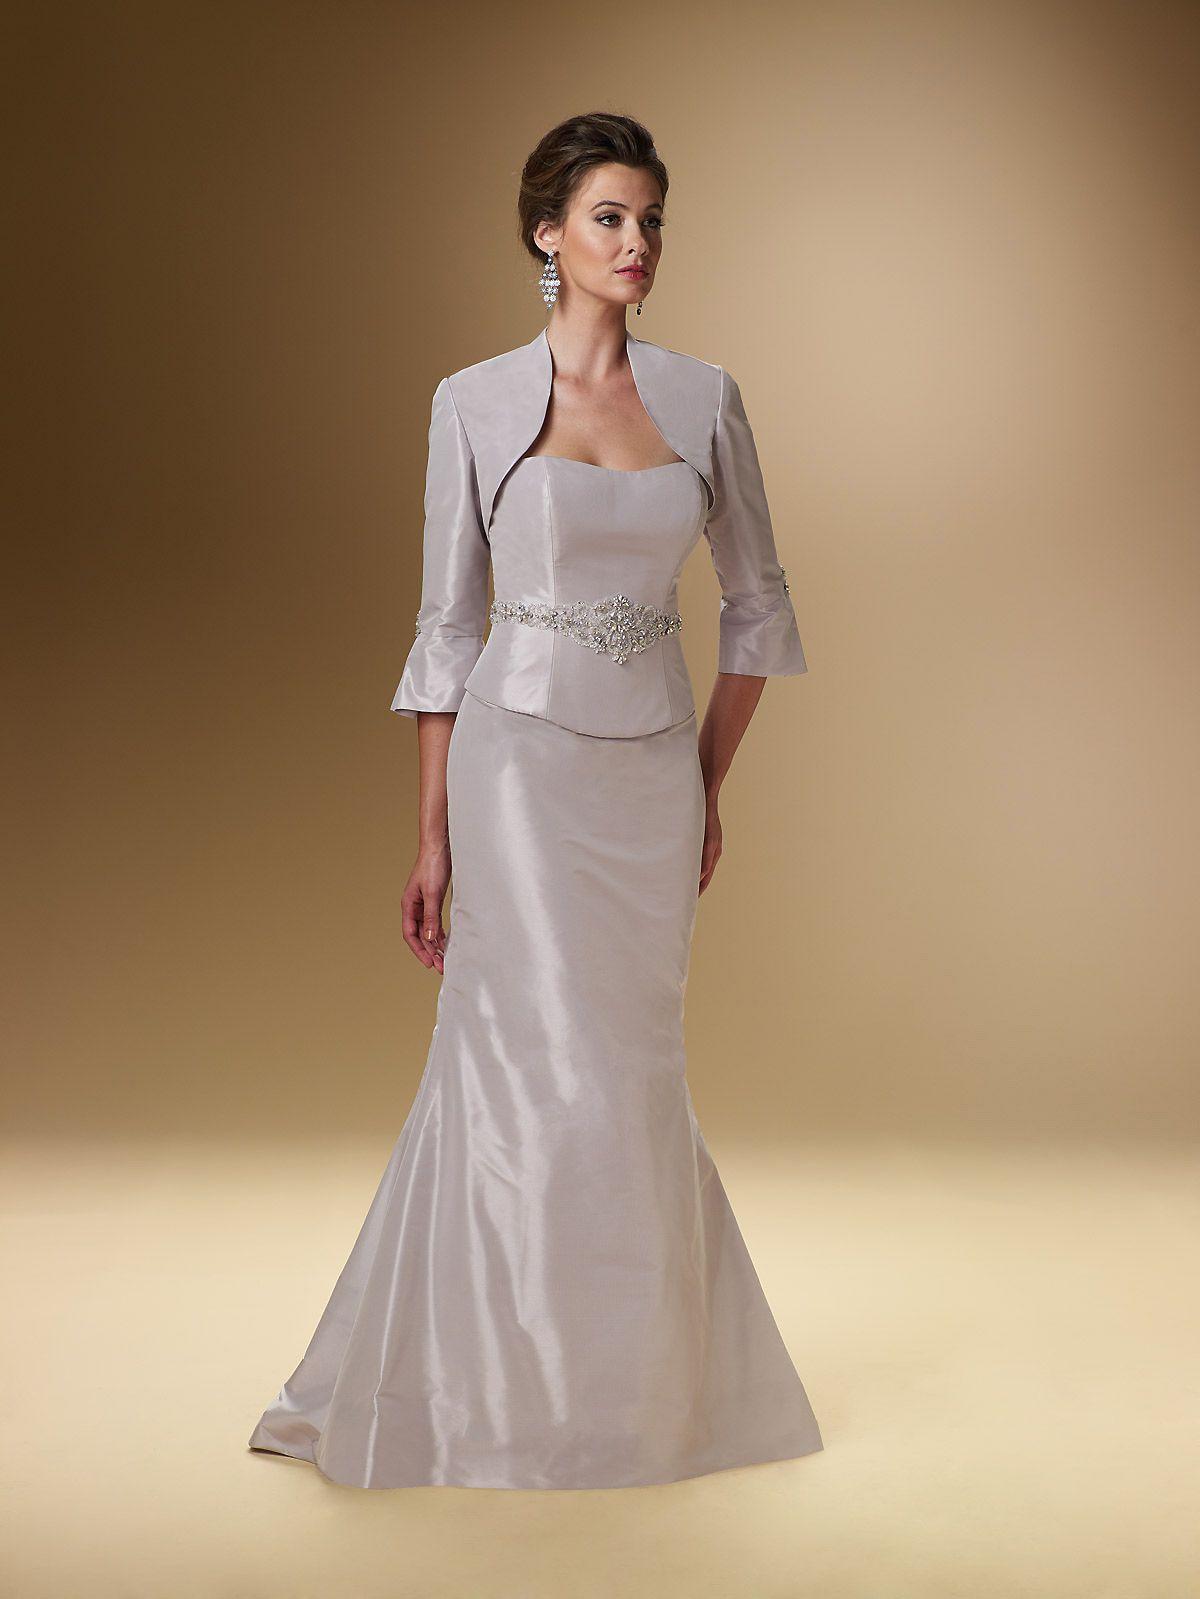 Wedding dresses for grandmother of the groom  SheathColumn Strapless Floorlength Taffeta Mother of the Bride